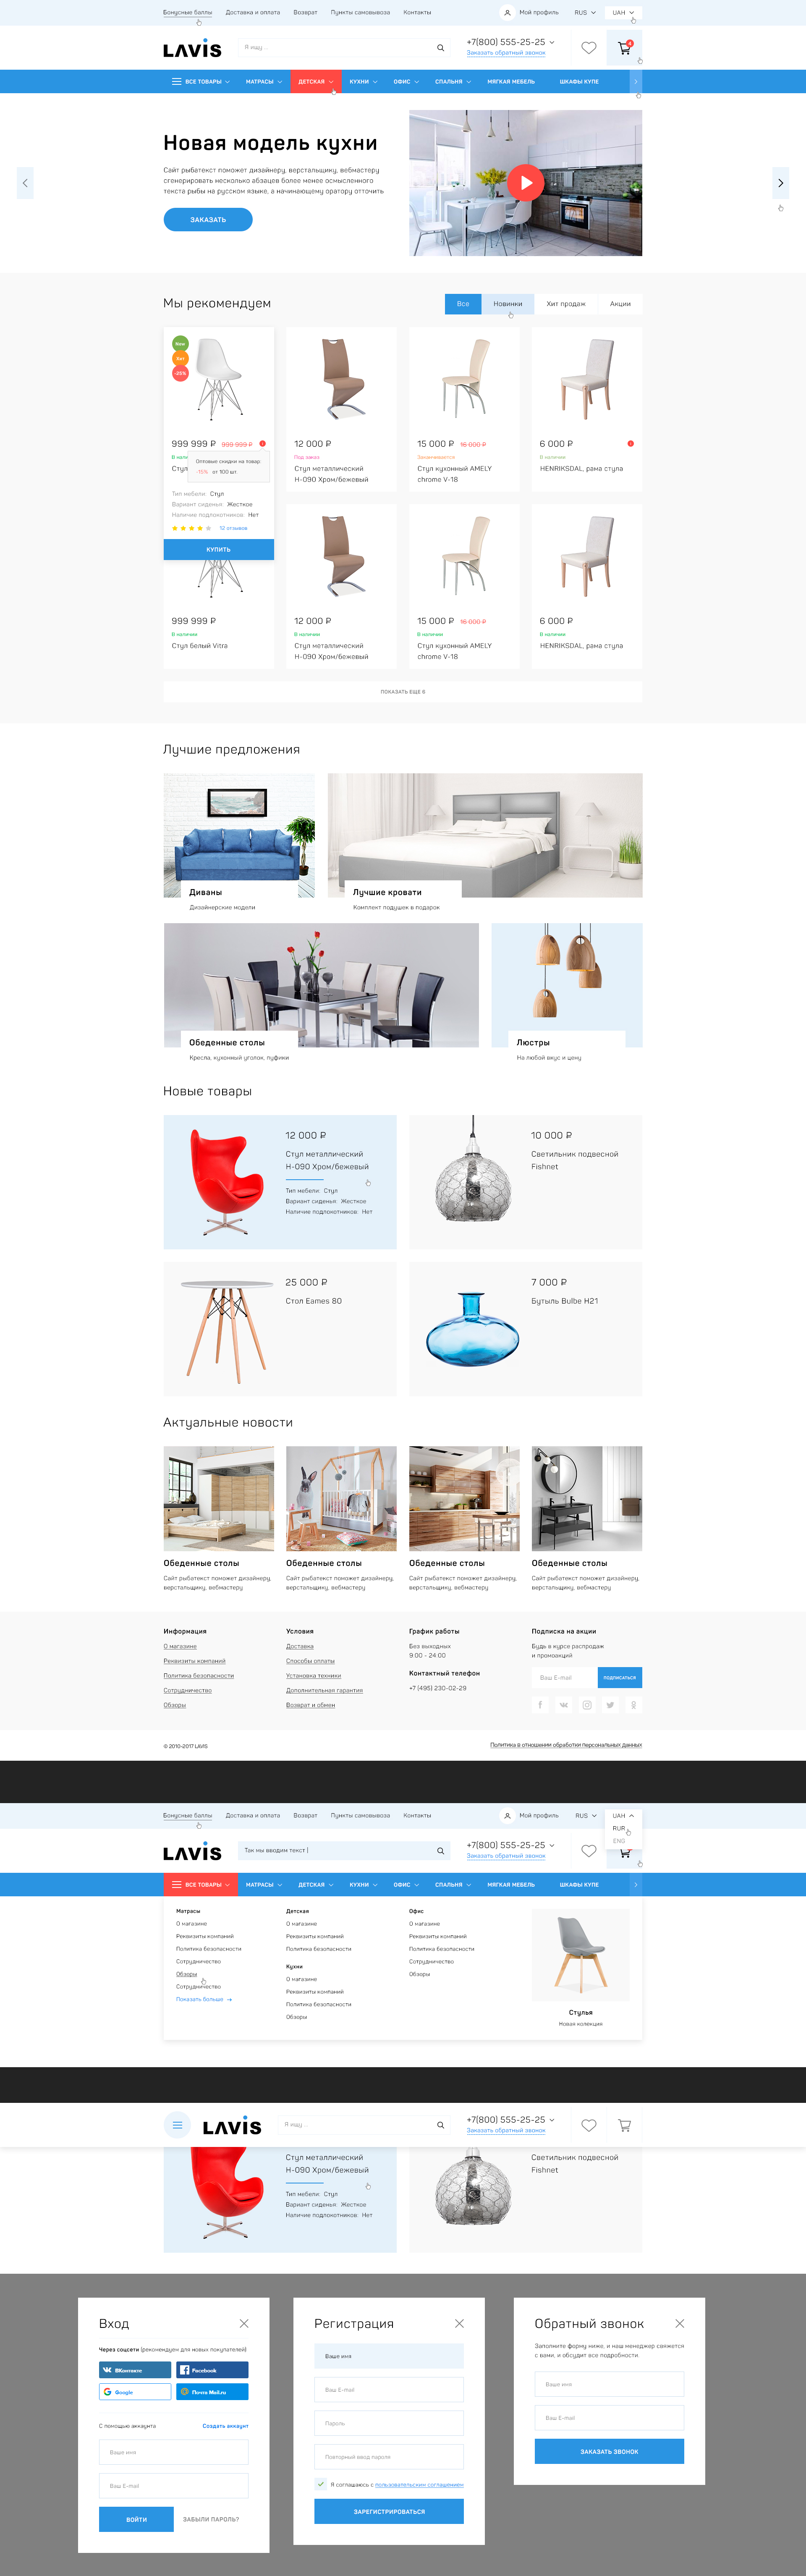 Интернет магазин мебели Lavis